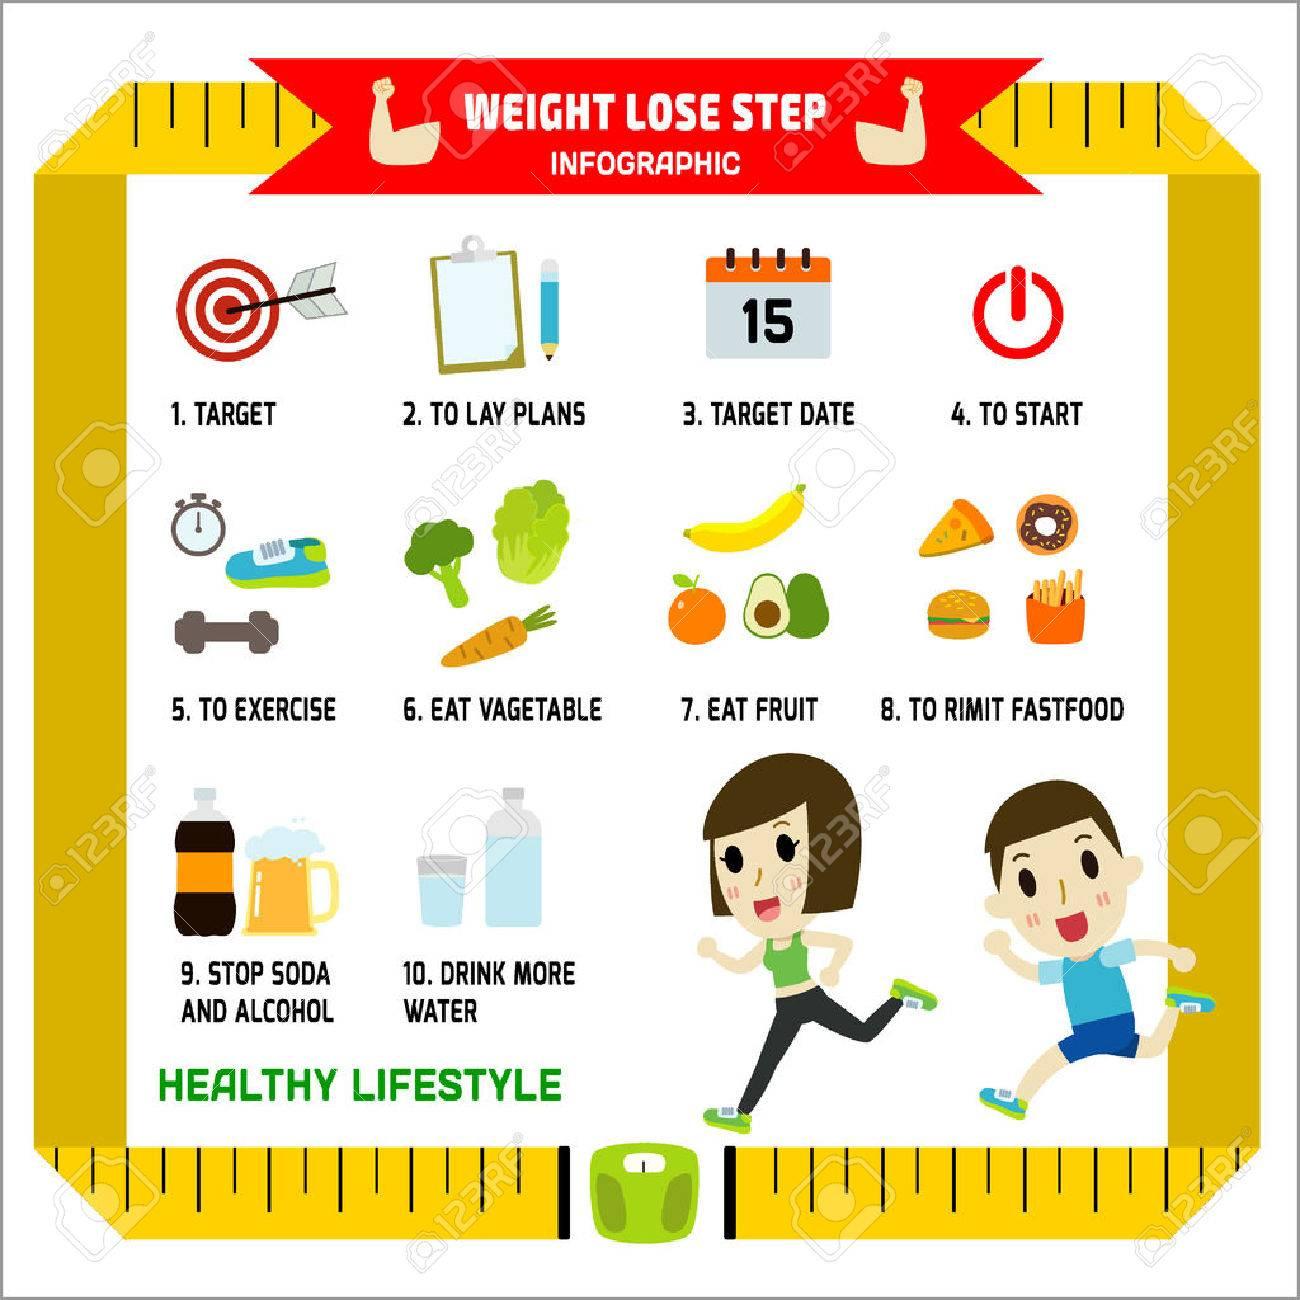 Diet regimen for weight loss photo 6